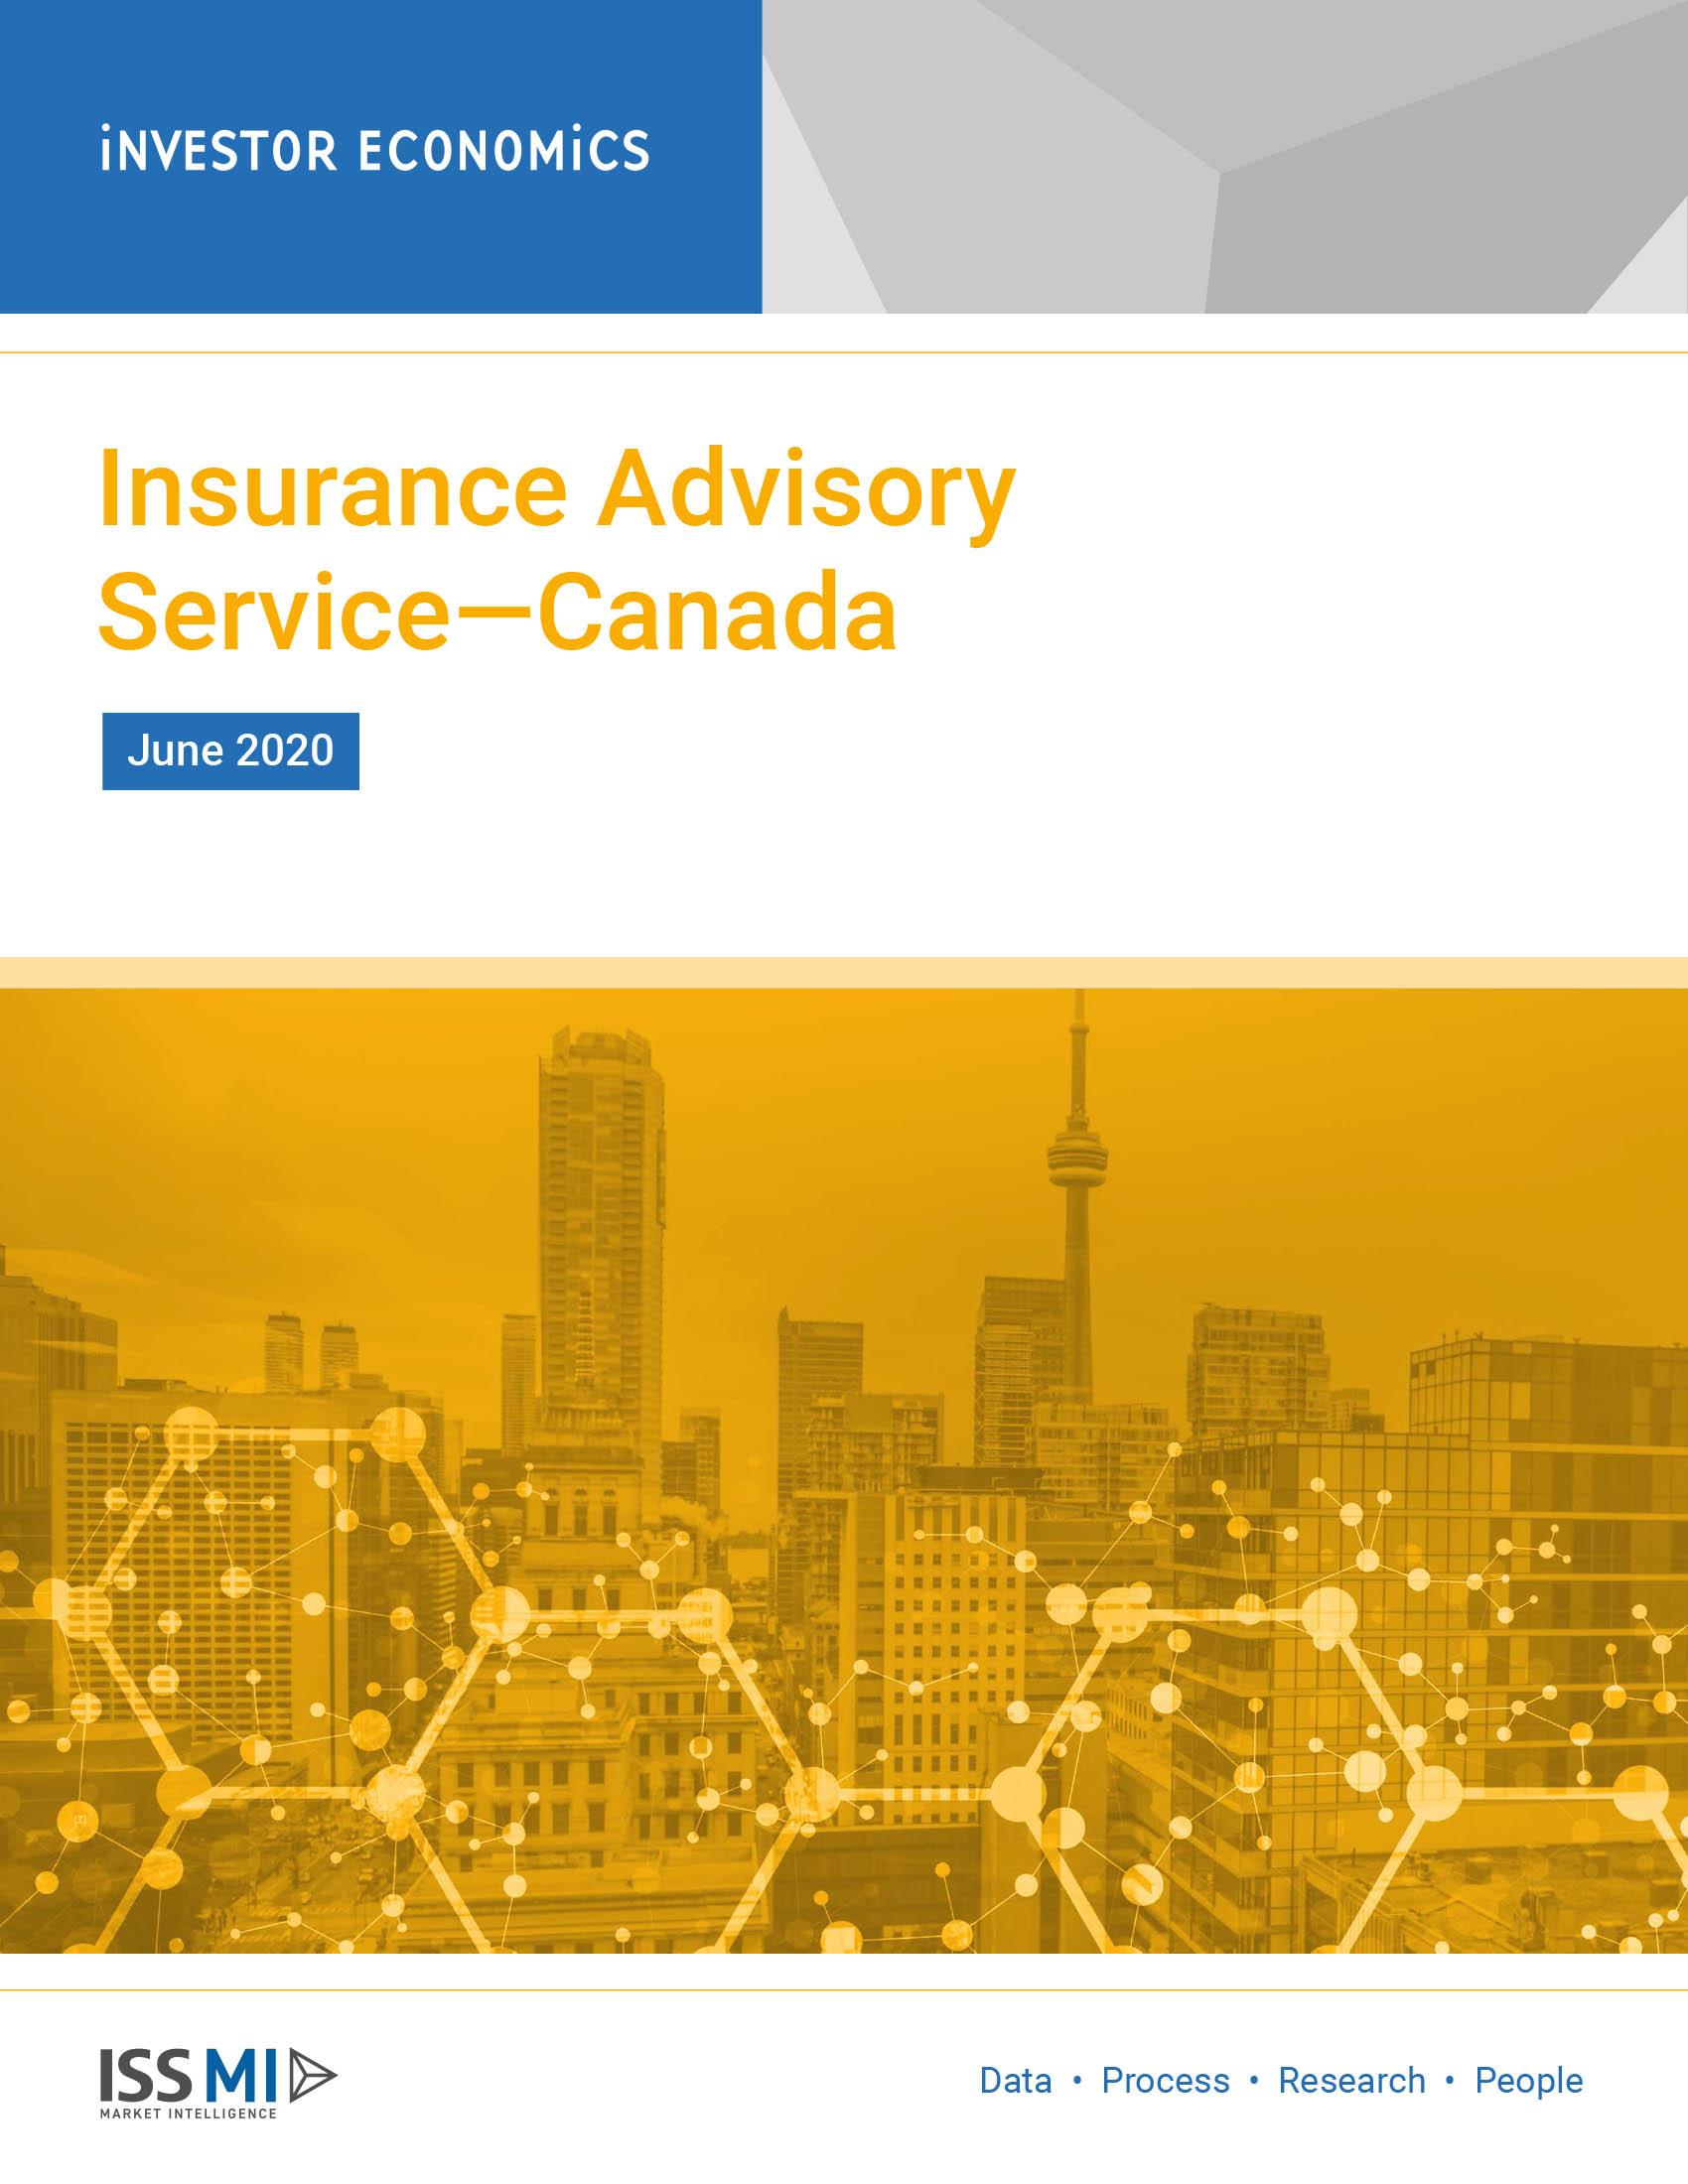 Insurance Advisory Service June 2020